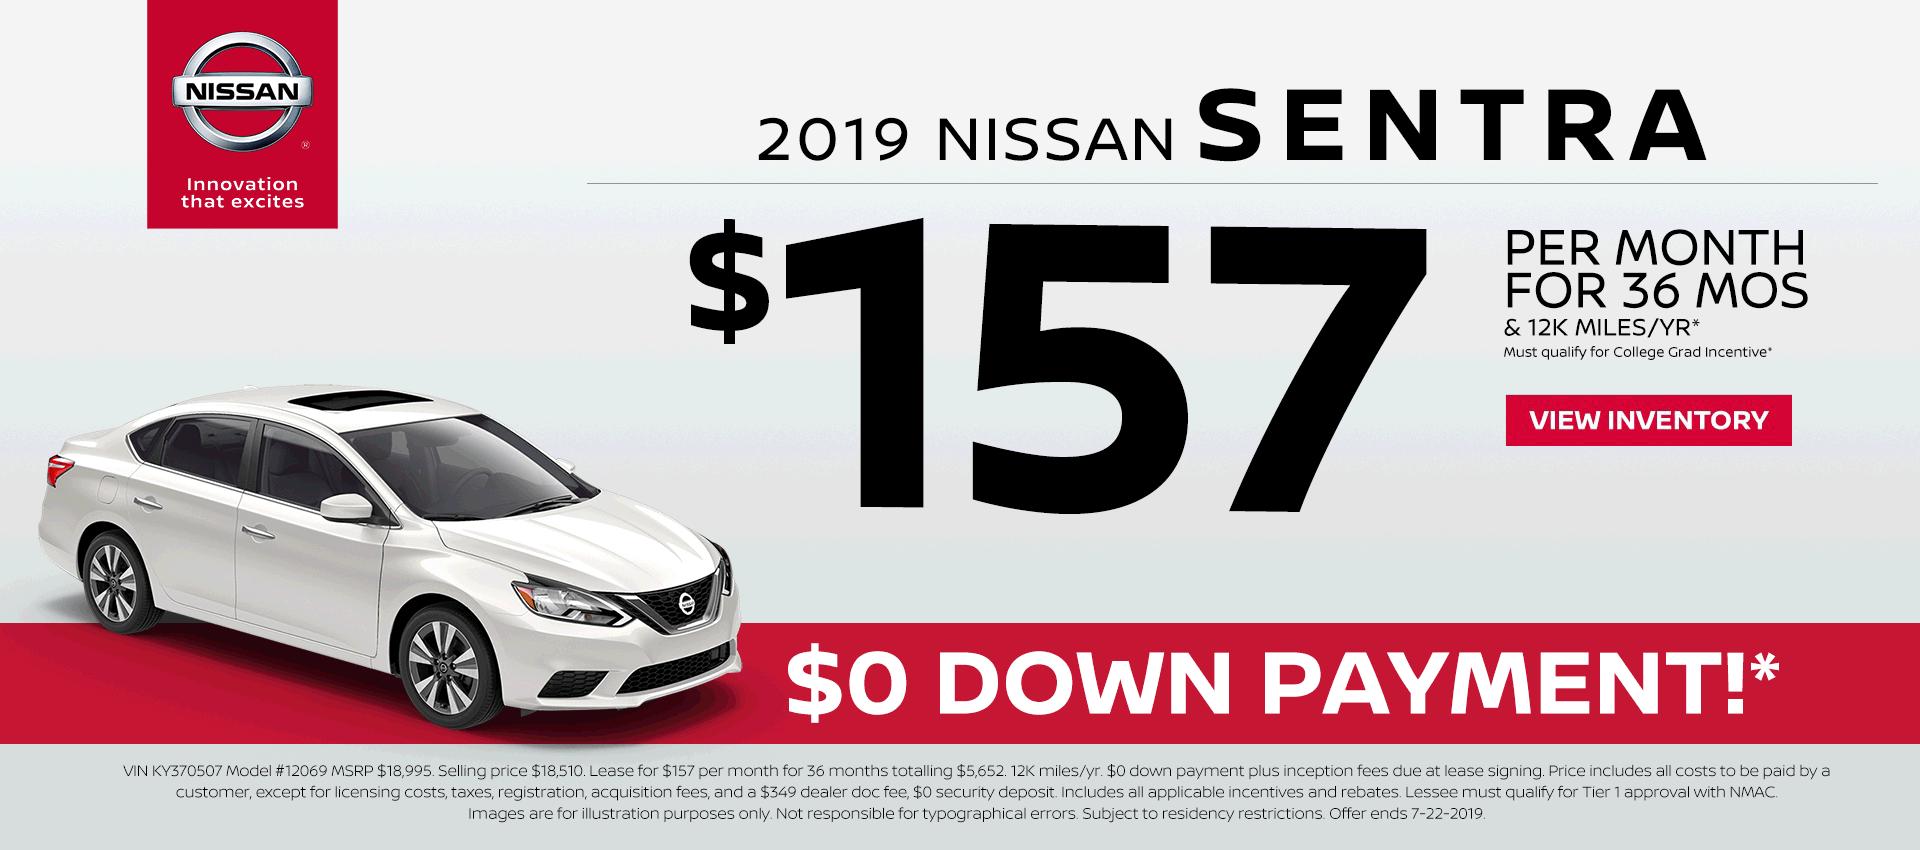 Nissan Dealers In Nj >> New Used Nissan Dealer In South Jersey Serving Philadelphia